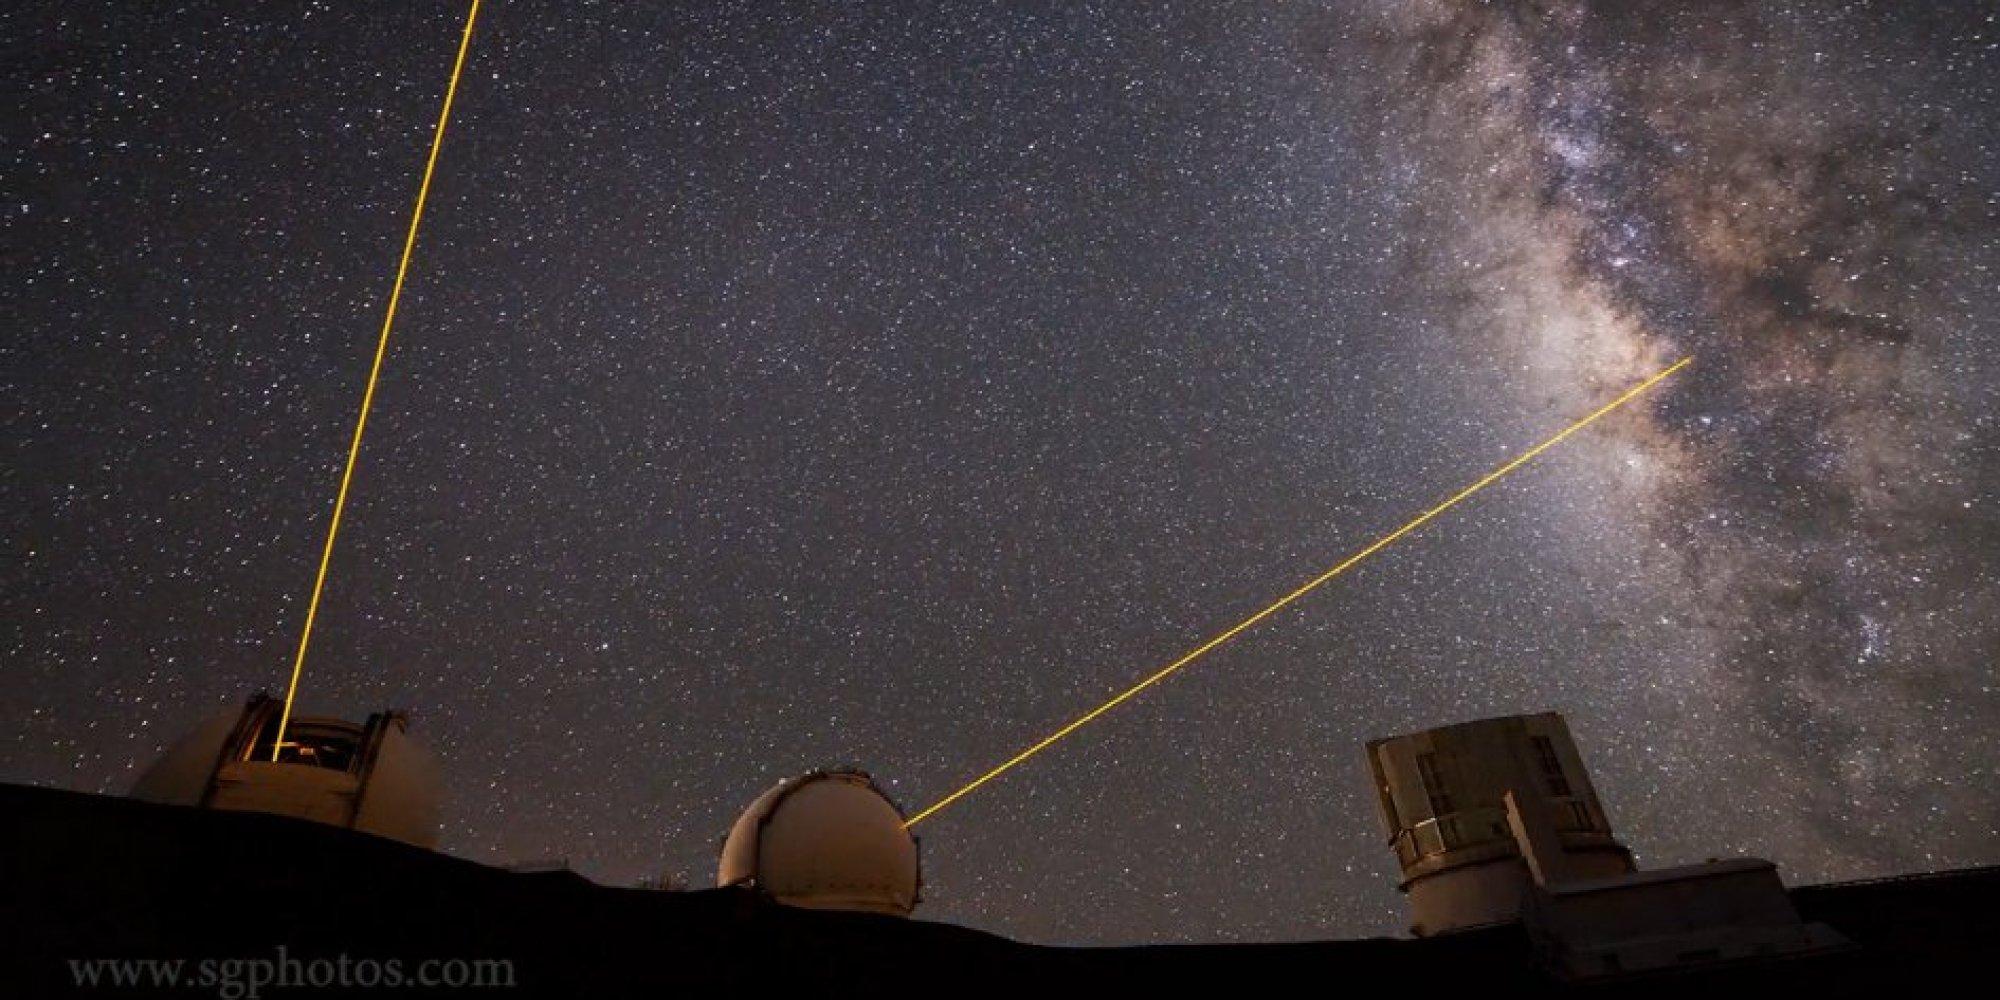 Hawaii Time-Lapse Shows Night Sky From Mauna Kea ...